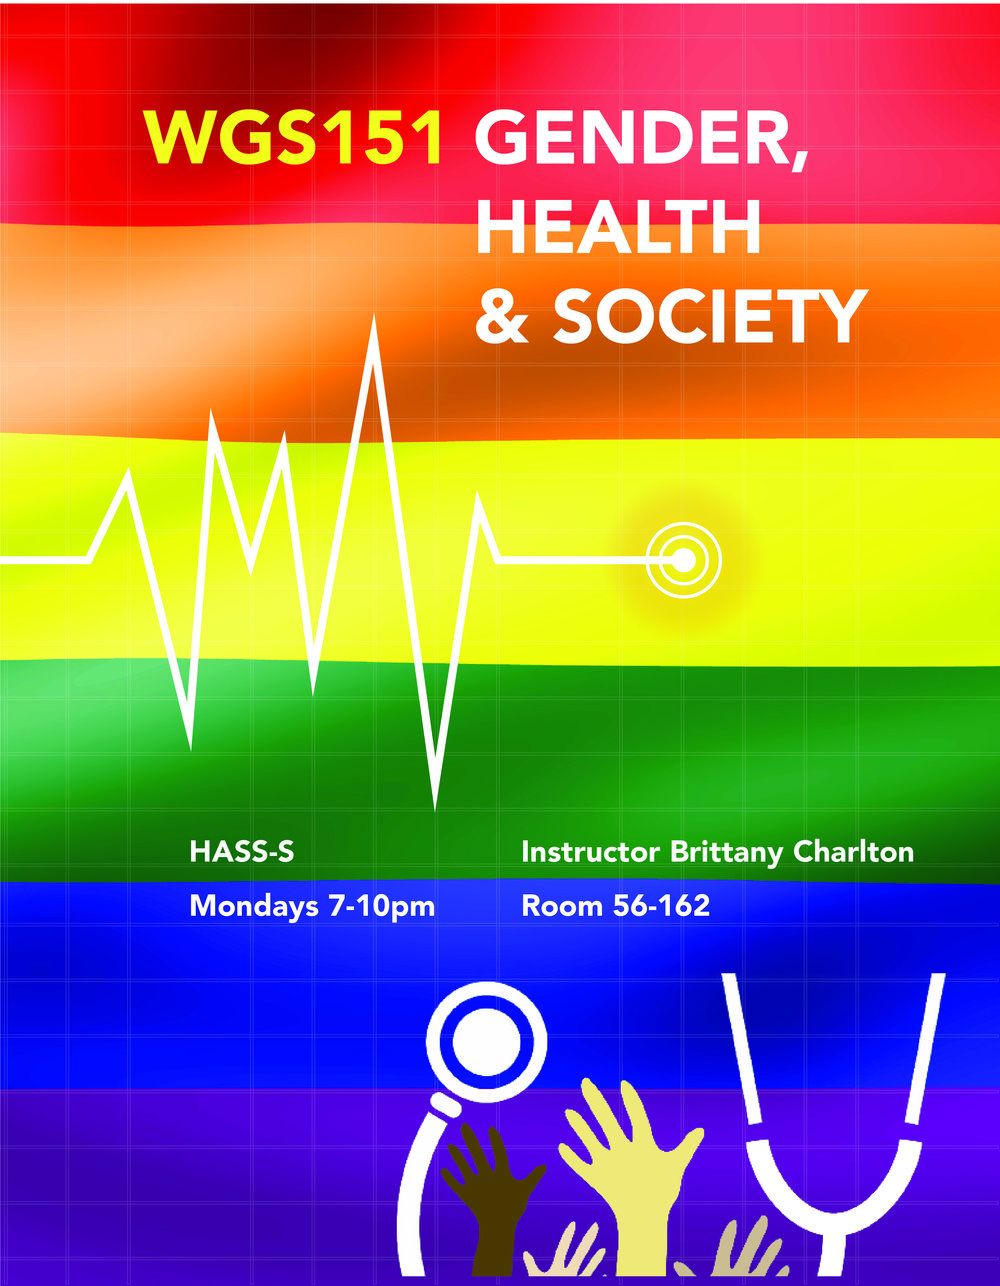 WGS.151-GenderHealthSociety-F-01.jpg